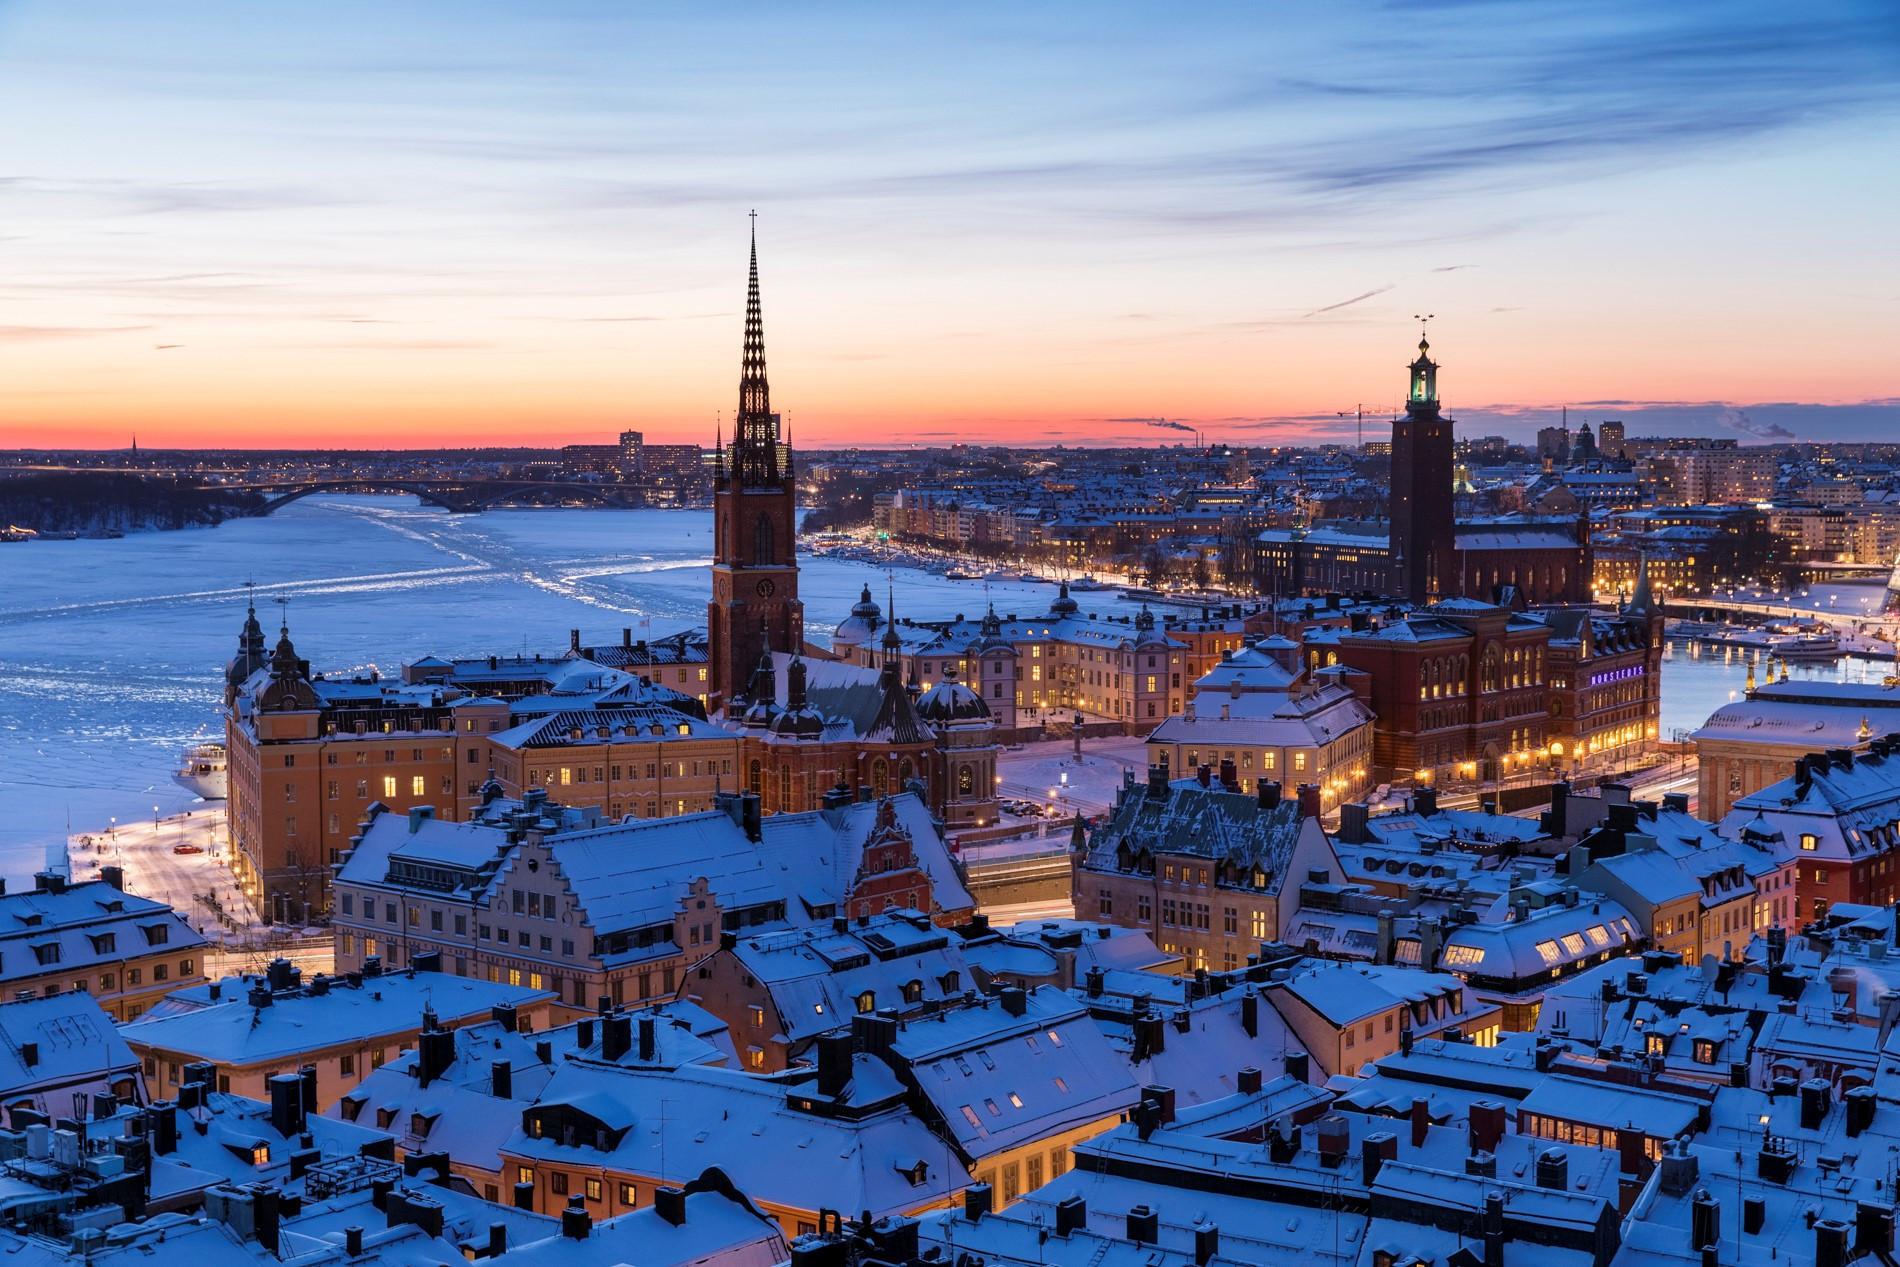 Stockholm Åre 2026 claims it has been inspired by Olympic Agenda 2020 ©Erik G Svensson/Stockholm Åre 2026